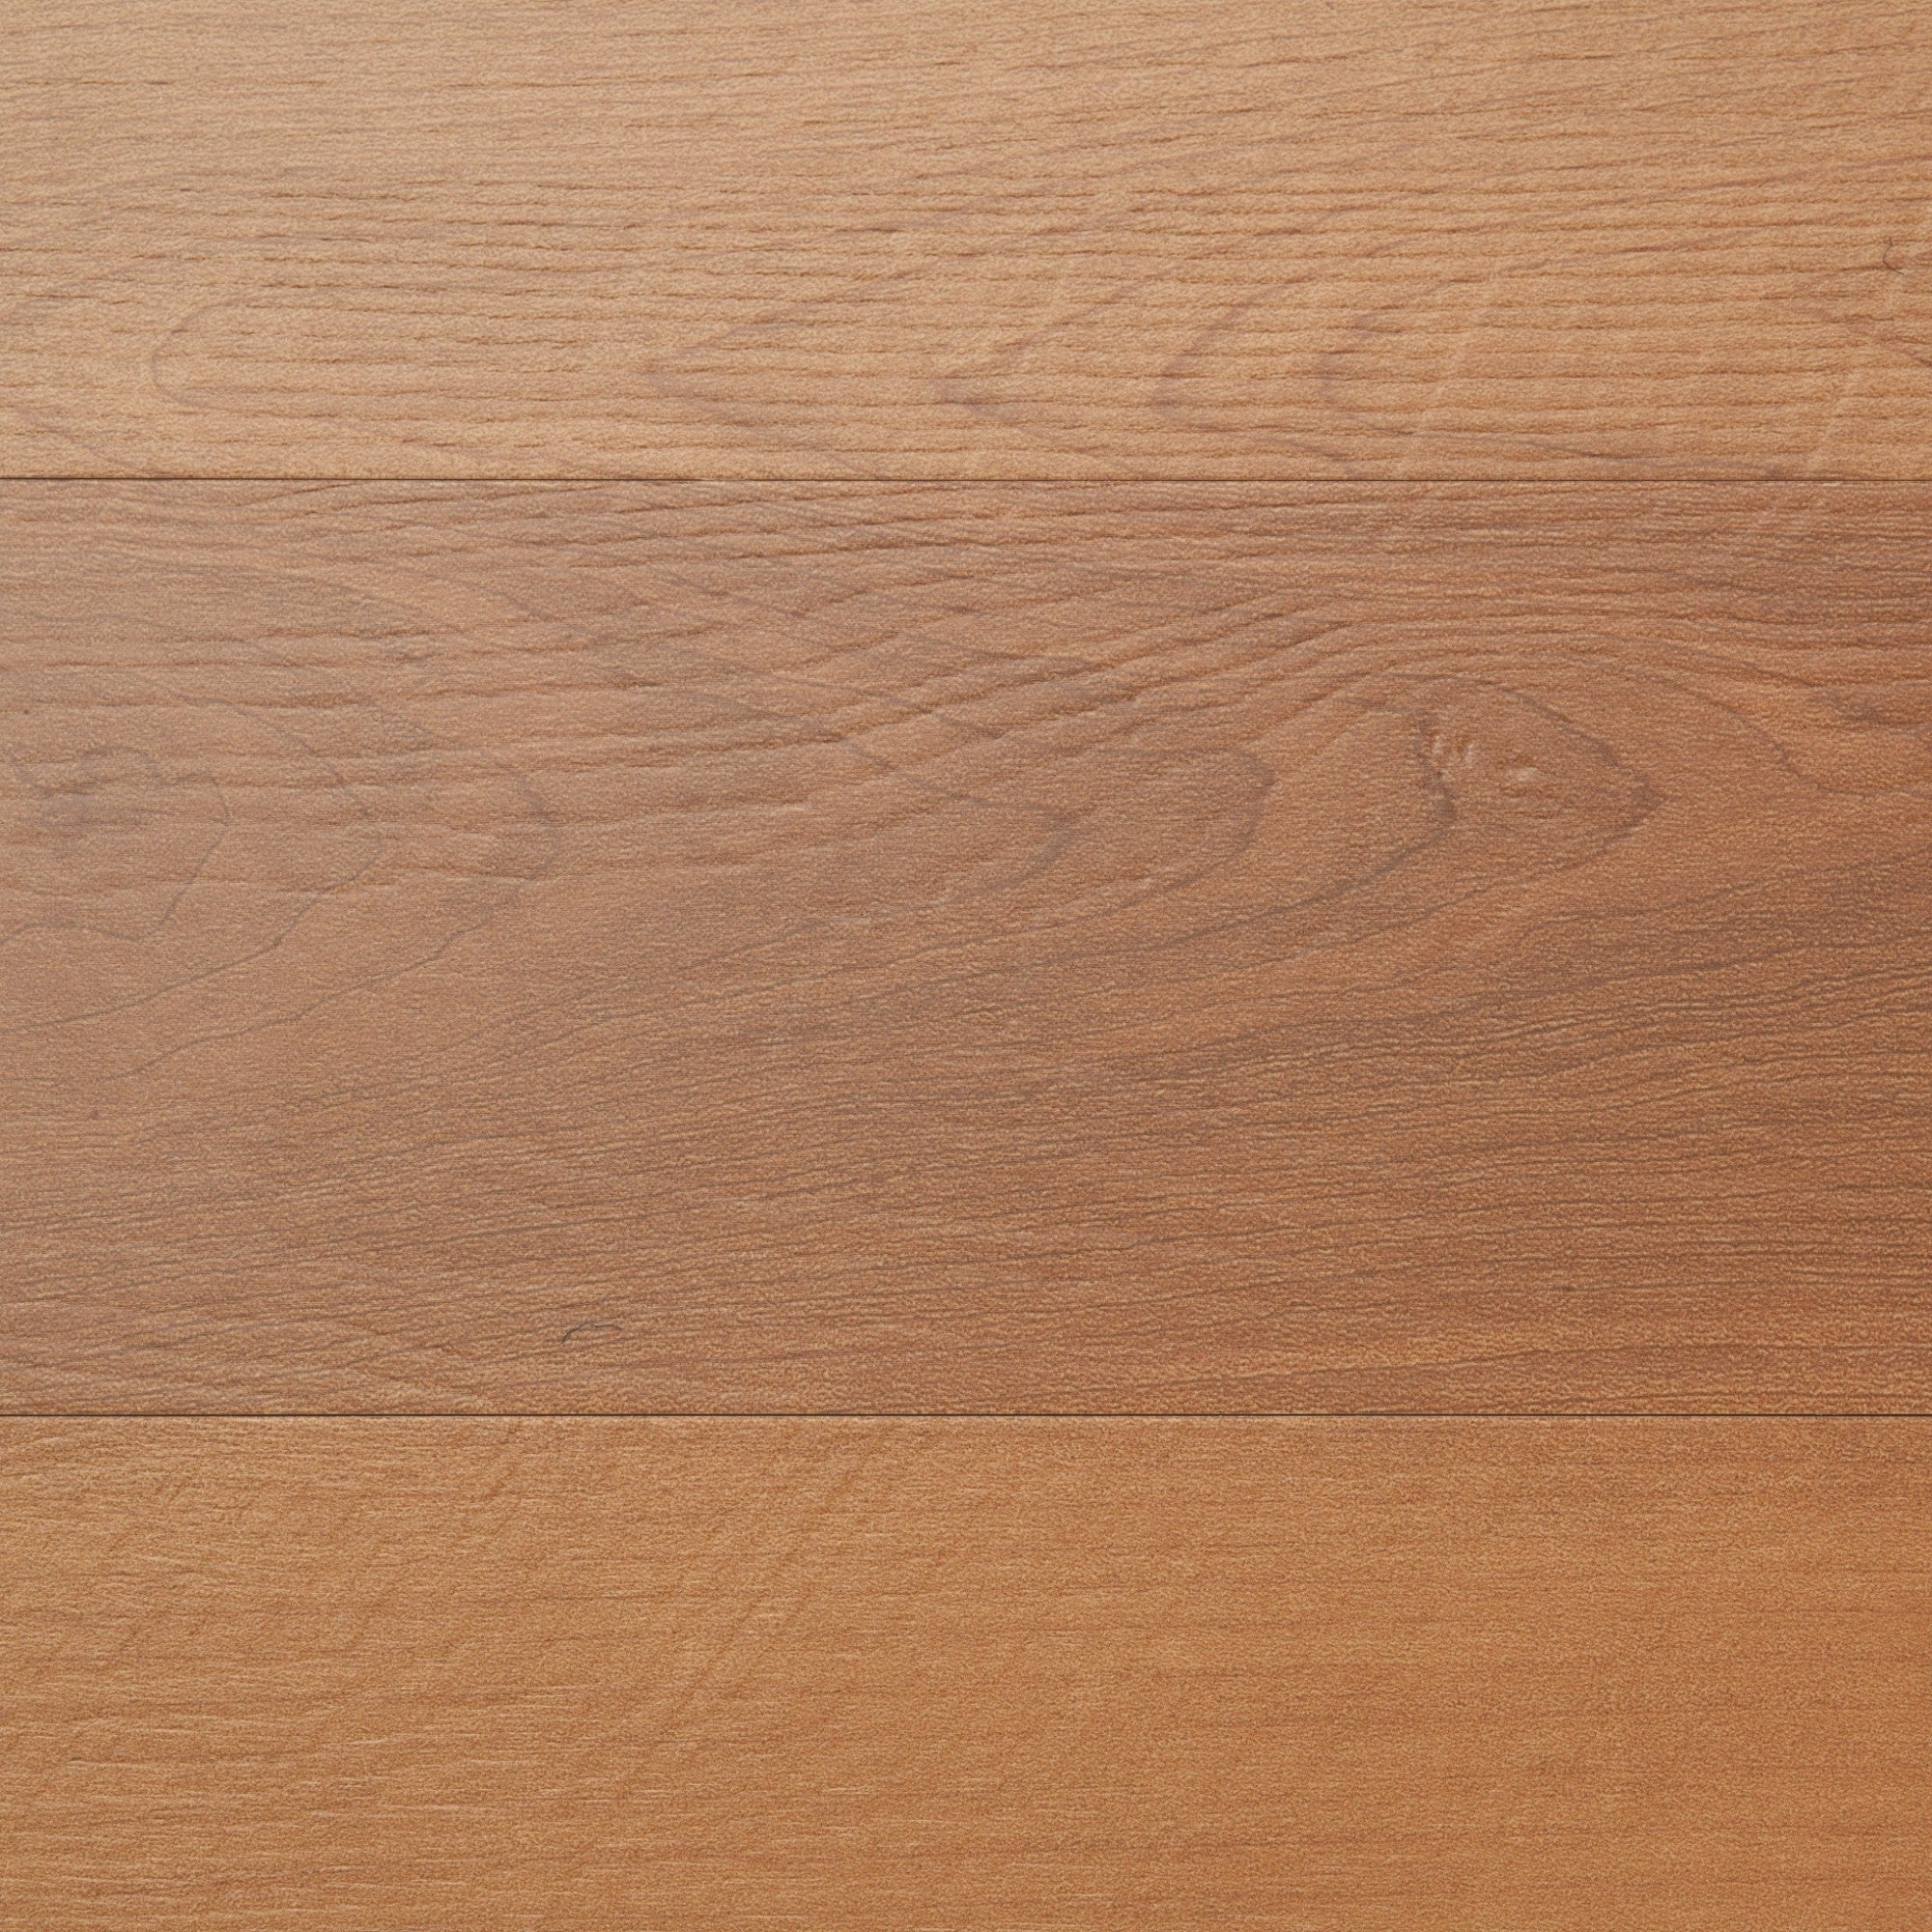 Shop Mats Inc Floorworks Plank Vinyl Floor Tiles Heritage Maple